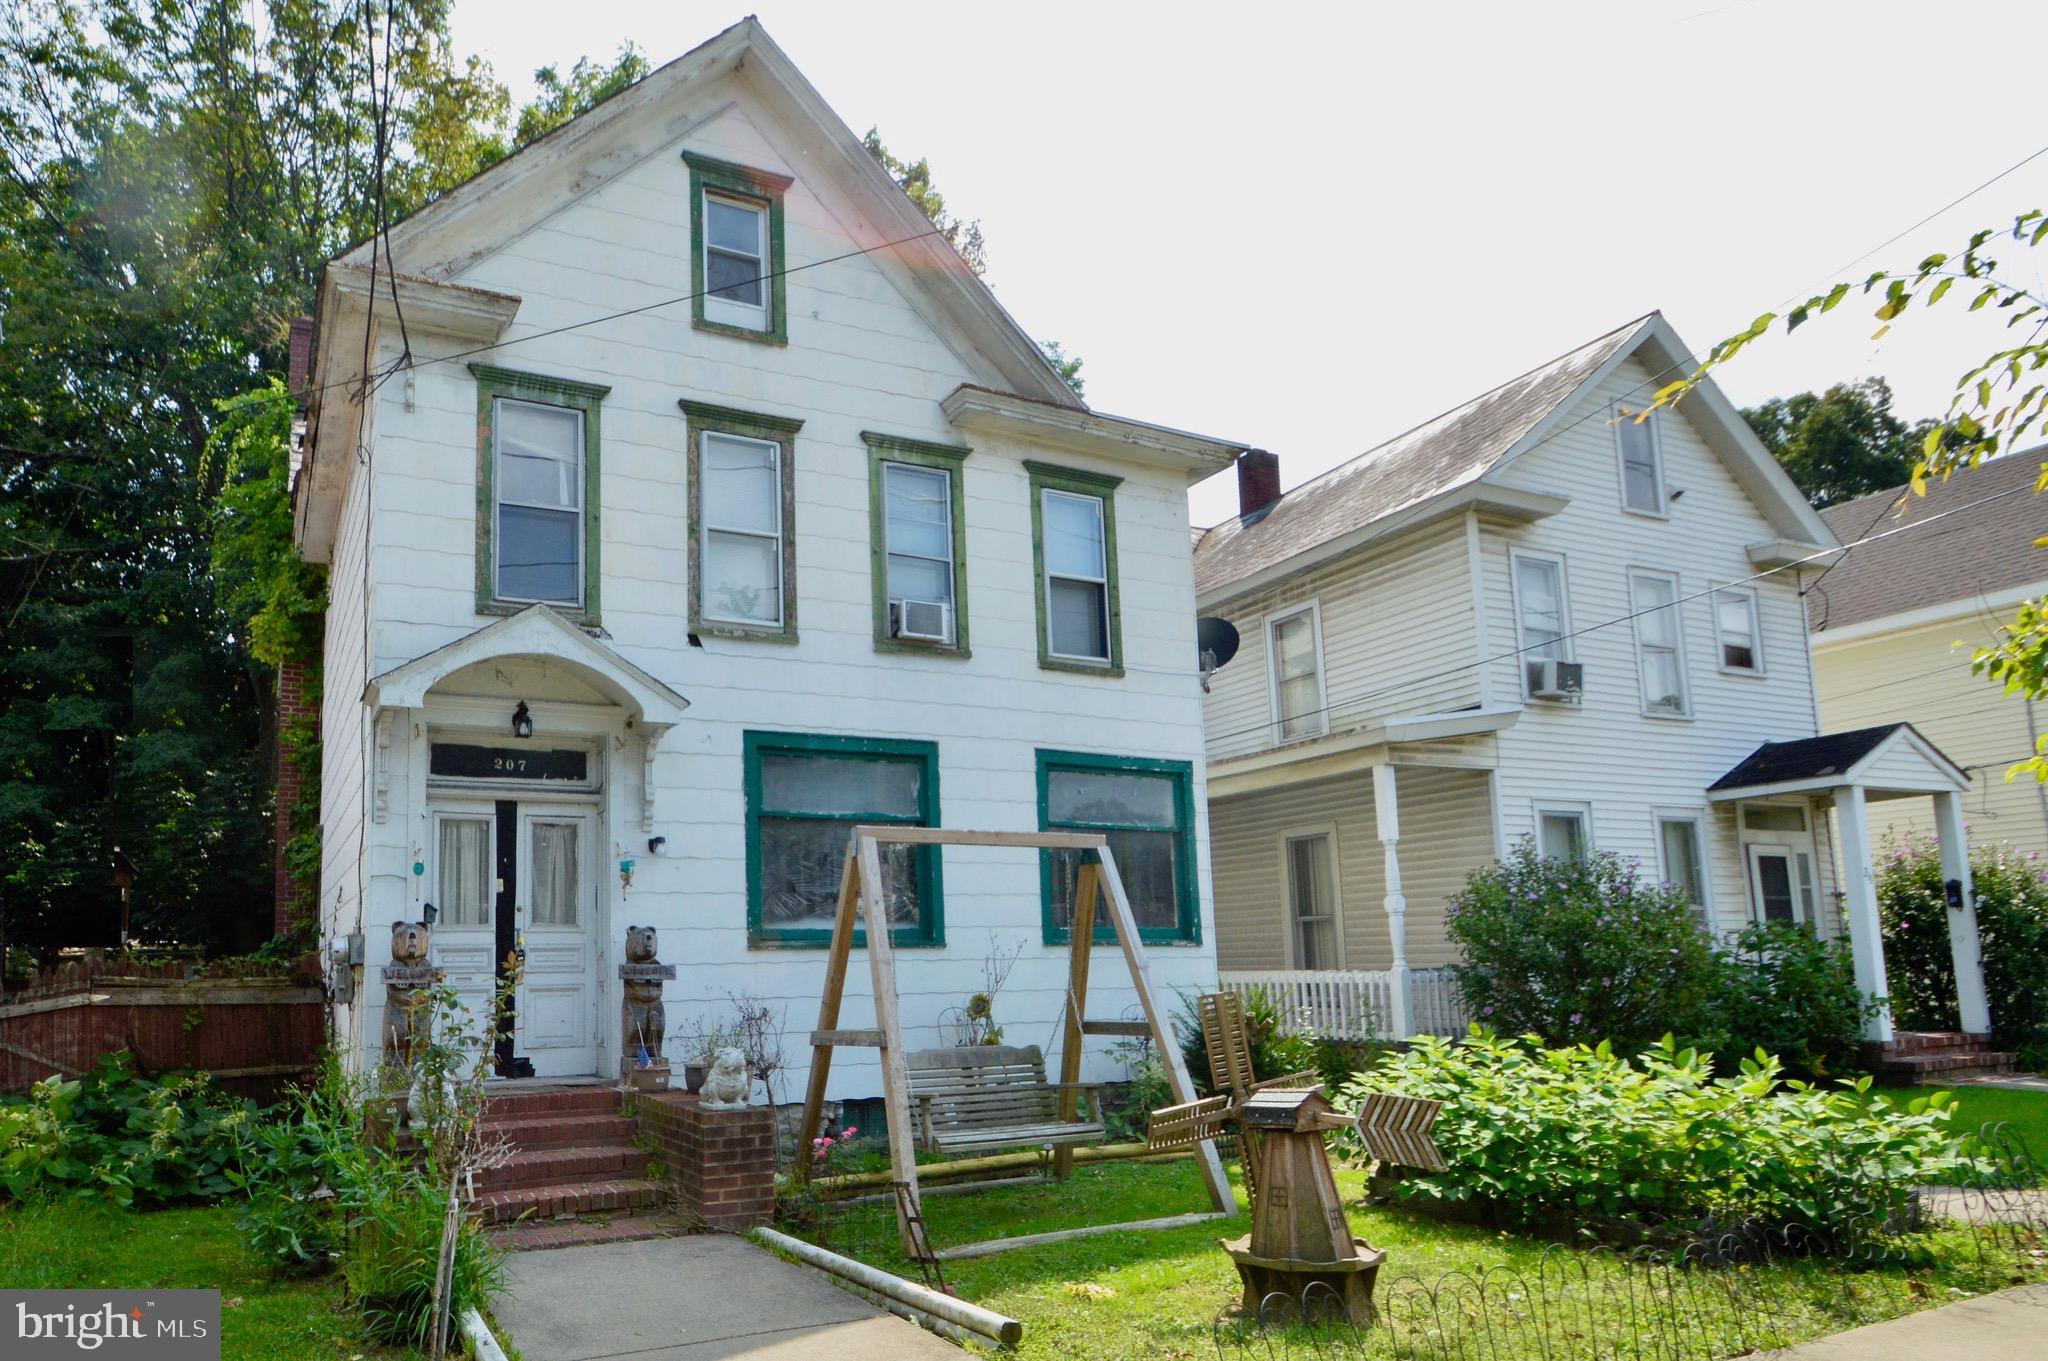 207 WASHINGTON, EAST STROUDSBURG, PA 18301